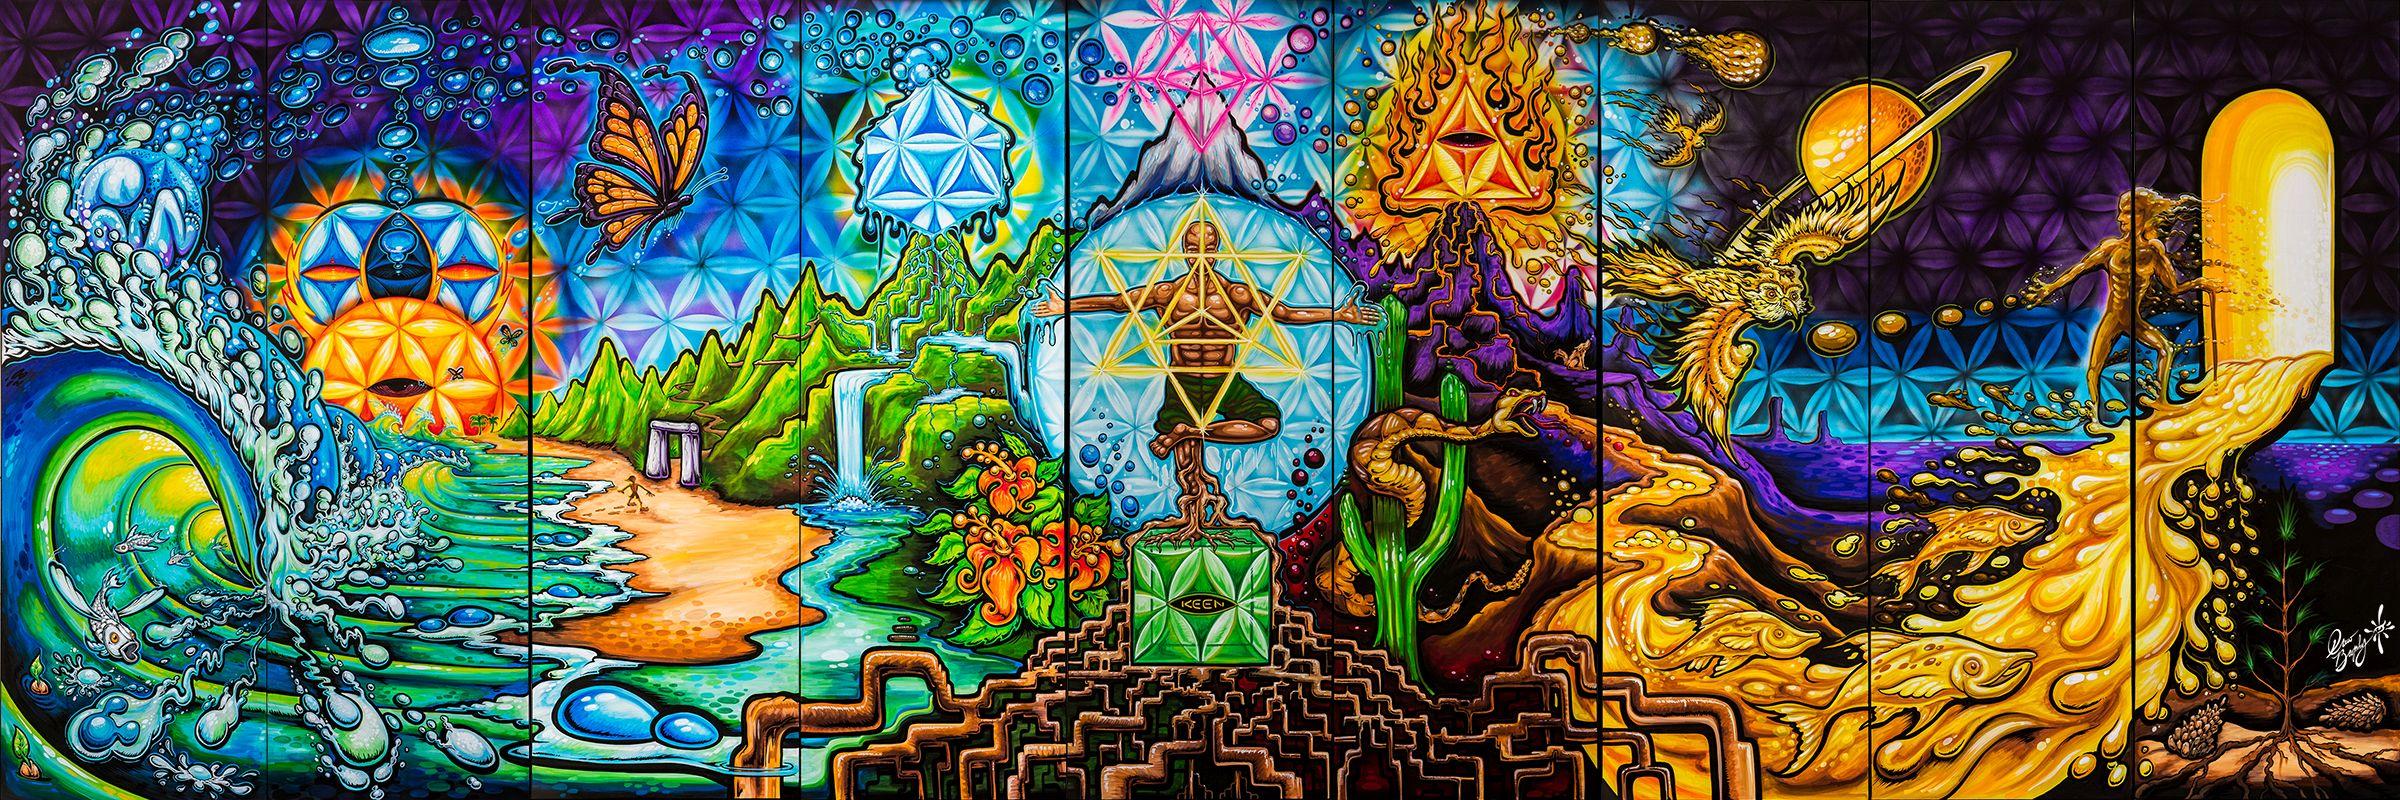 ALifeWellLived_-drew-brophy-mural-art-painting-keenfest-sacred-geometry.jpg